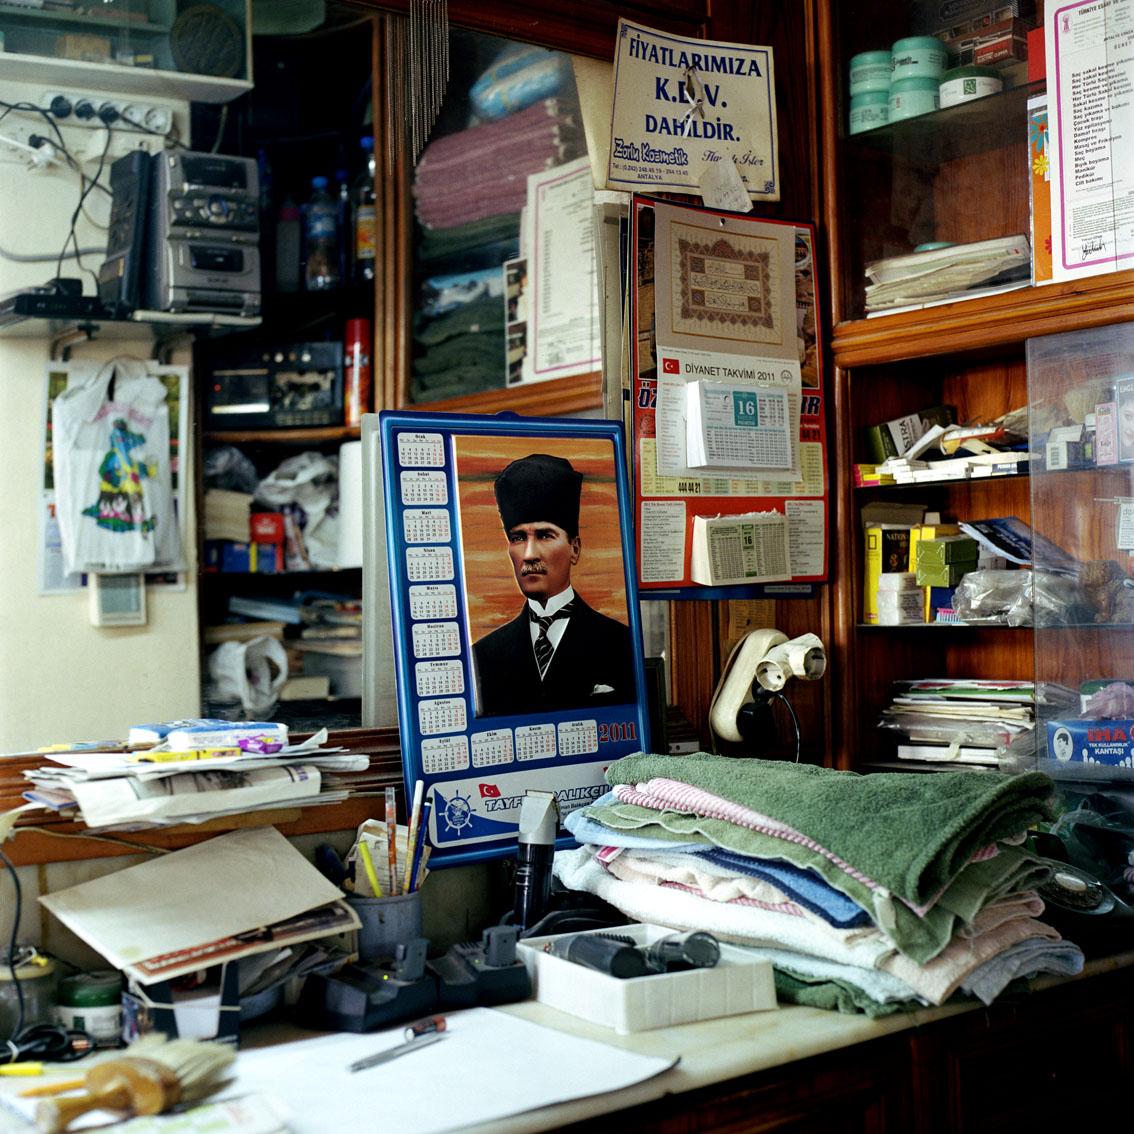 Barber shop in Antalya, Turkey